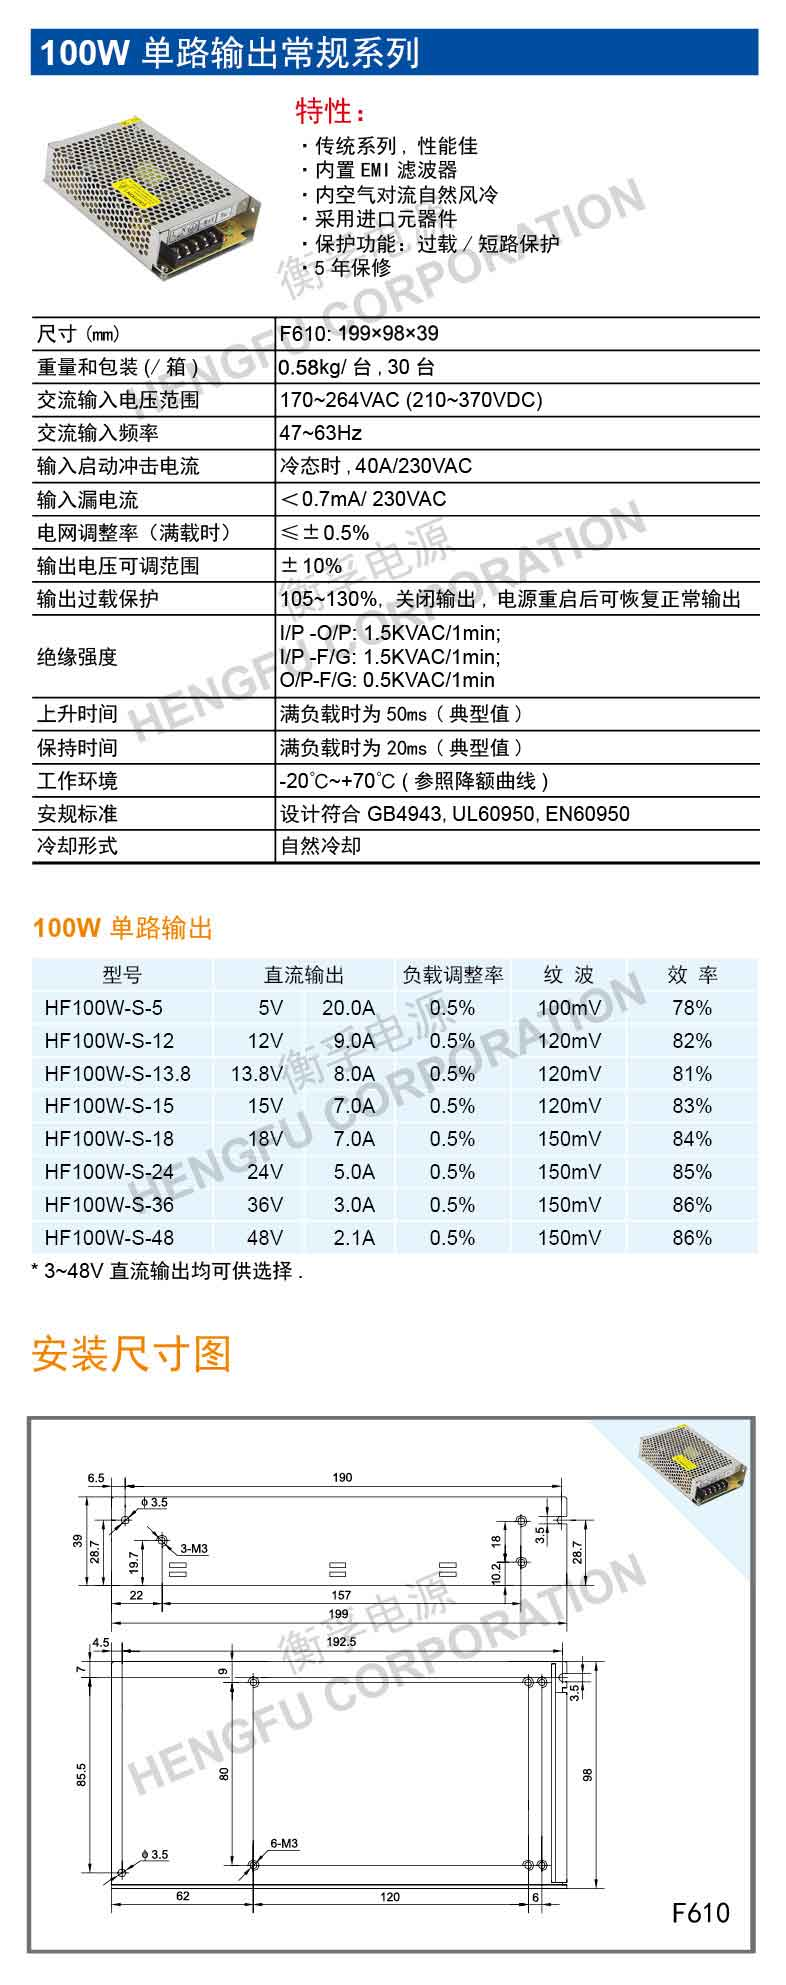 HF100W-S-中文.jpg